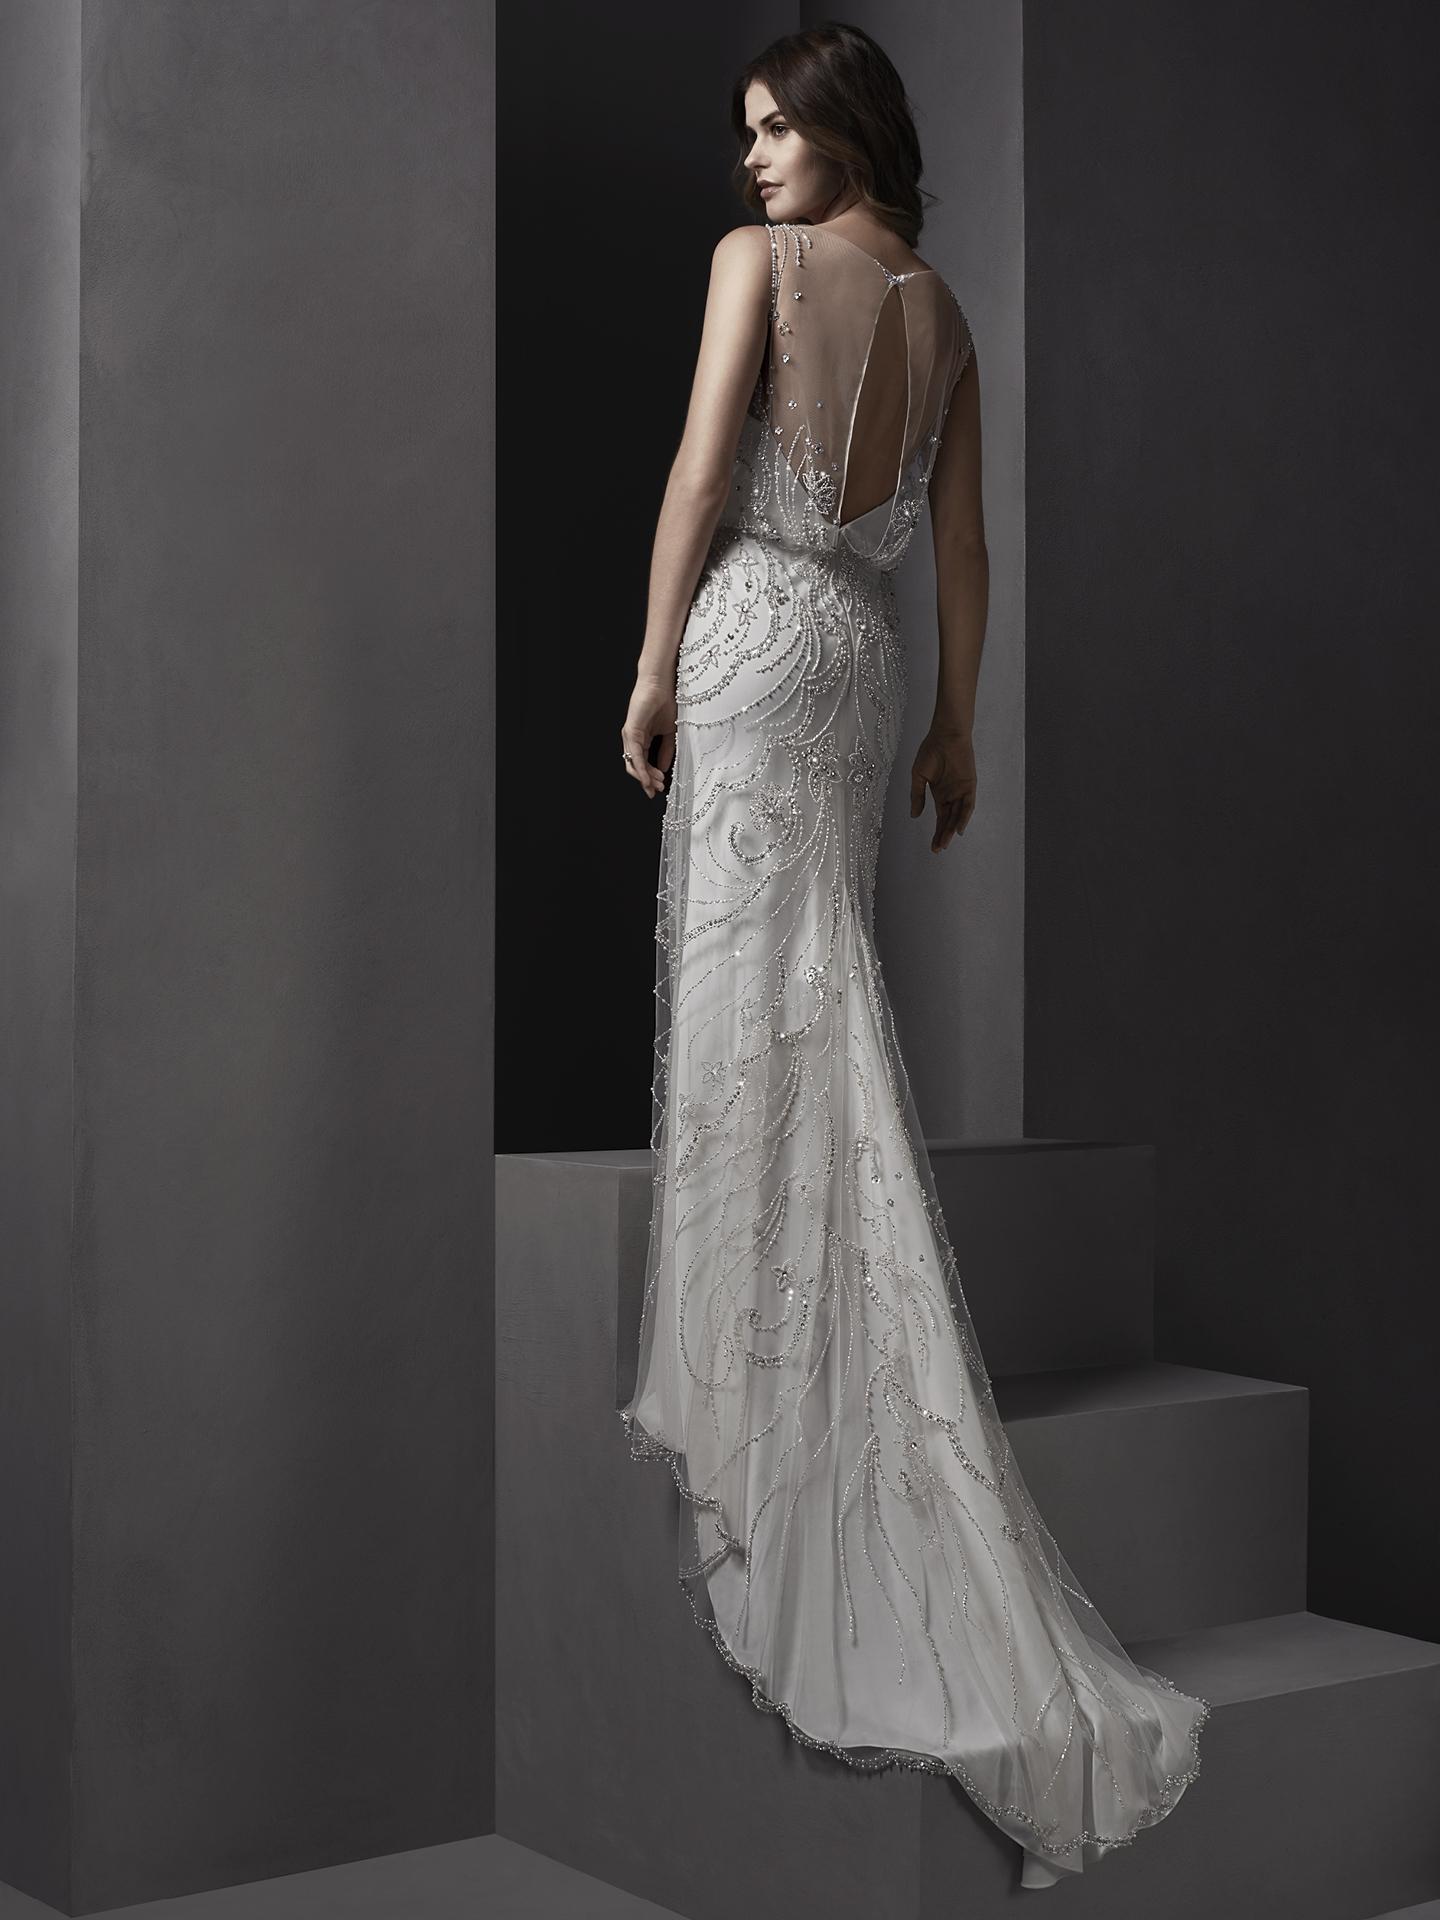 Great Gatsby Inspired Wedding Dresses  Great Gatsby In...